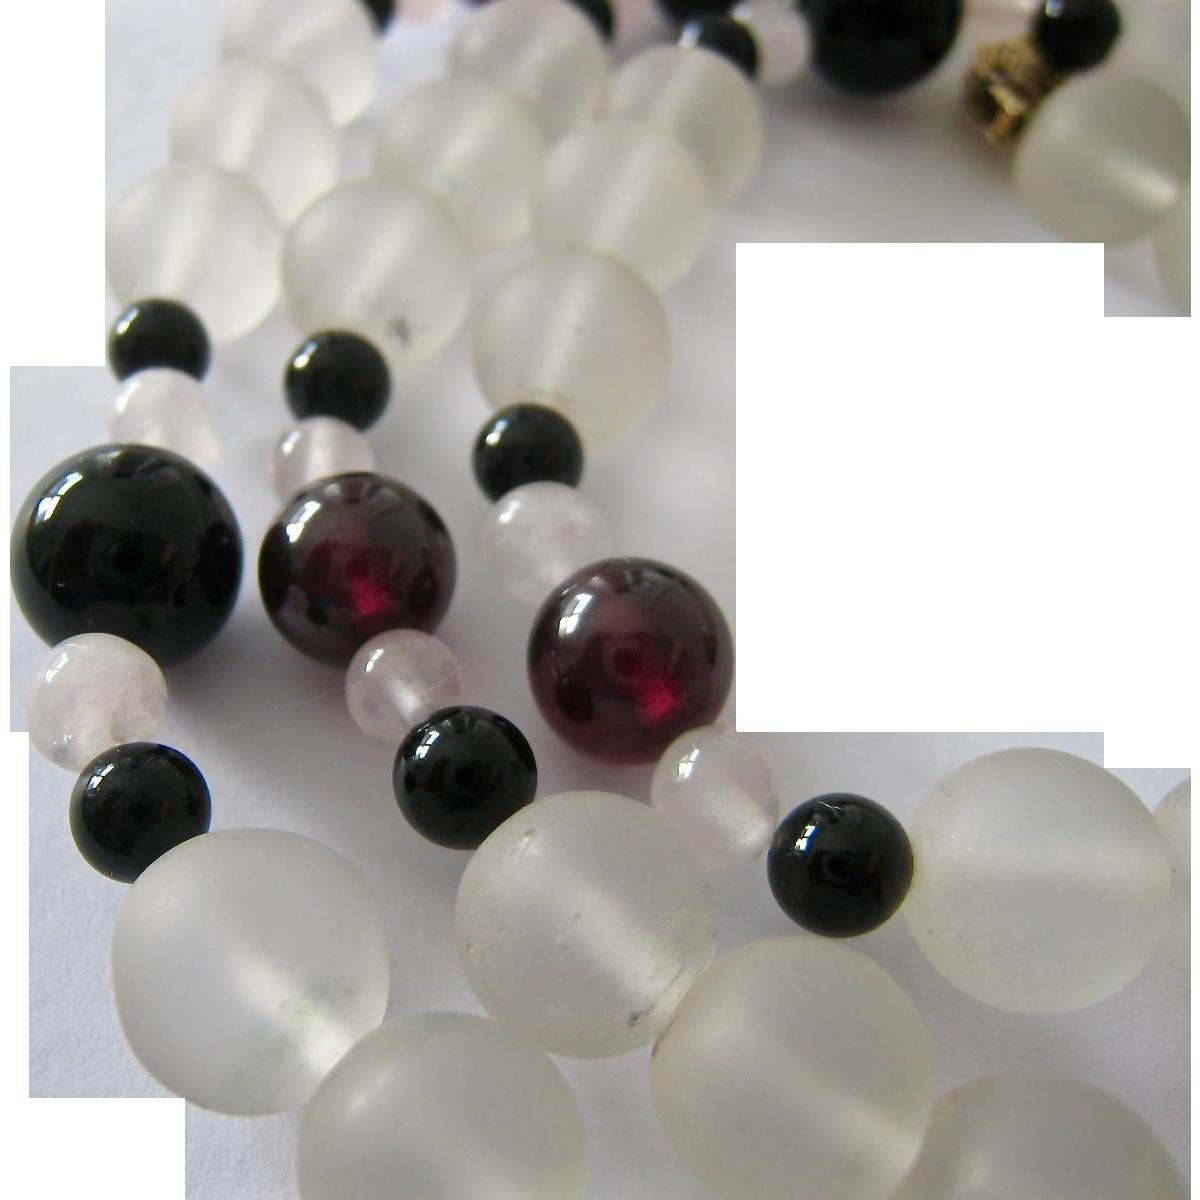 Multi Gemstone Bead Necklace Rock Crystal Garnet Black Onyx Over 24 From Susabellas On Ruby Lane